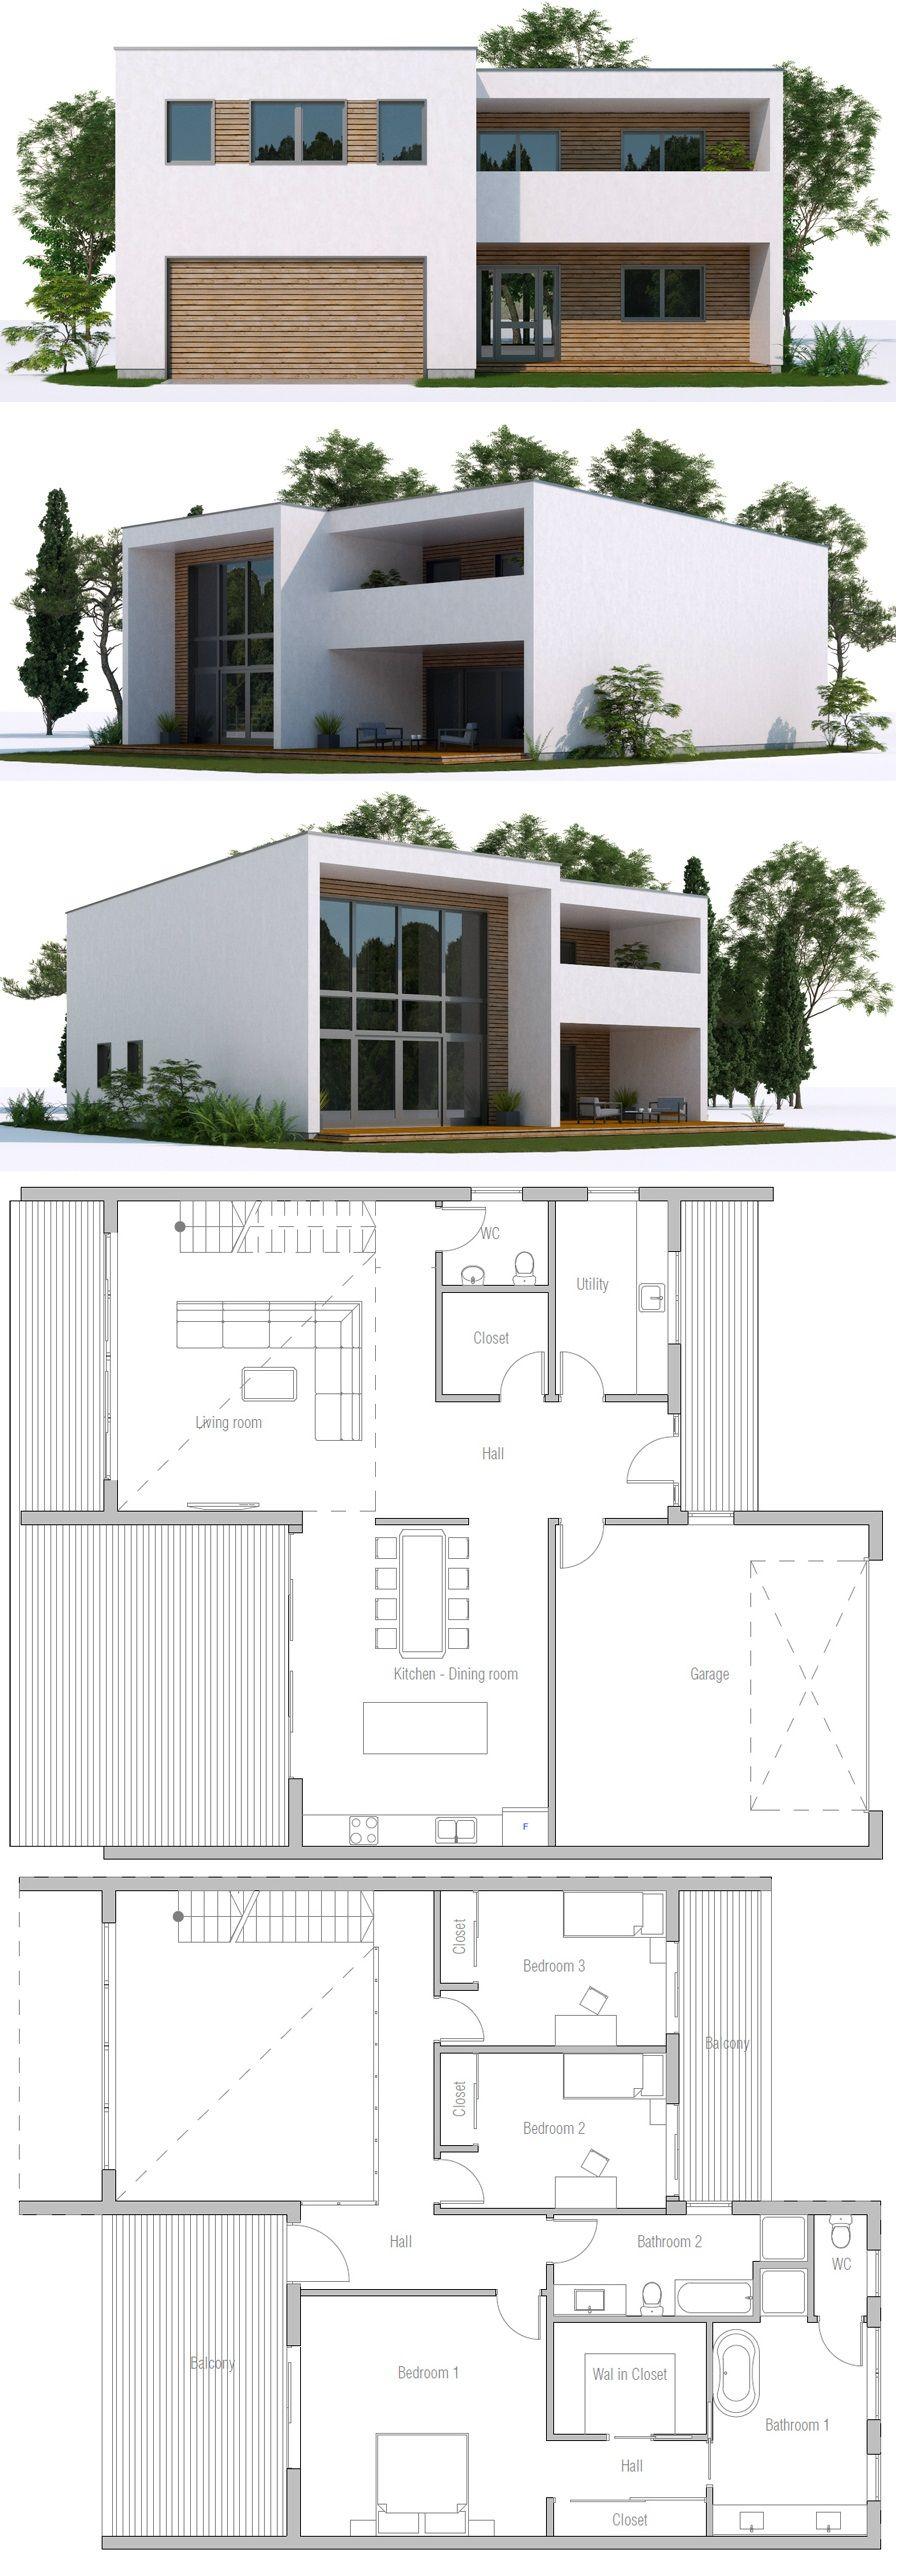 Modern Minimalist House Plan Contemporary Home Plan Modernhousedesign Modernhouseplans Modern Minimalist House Modern House Design Contemporary House Design